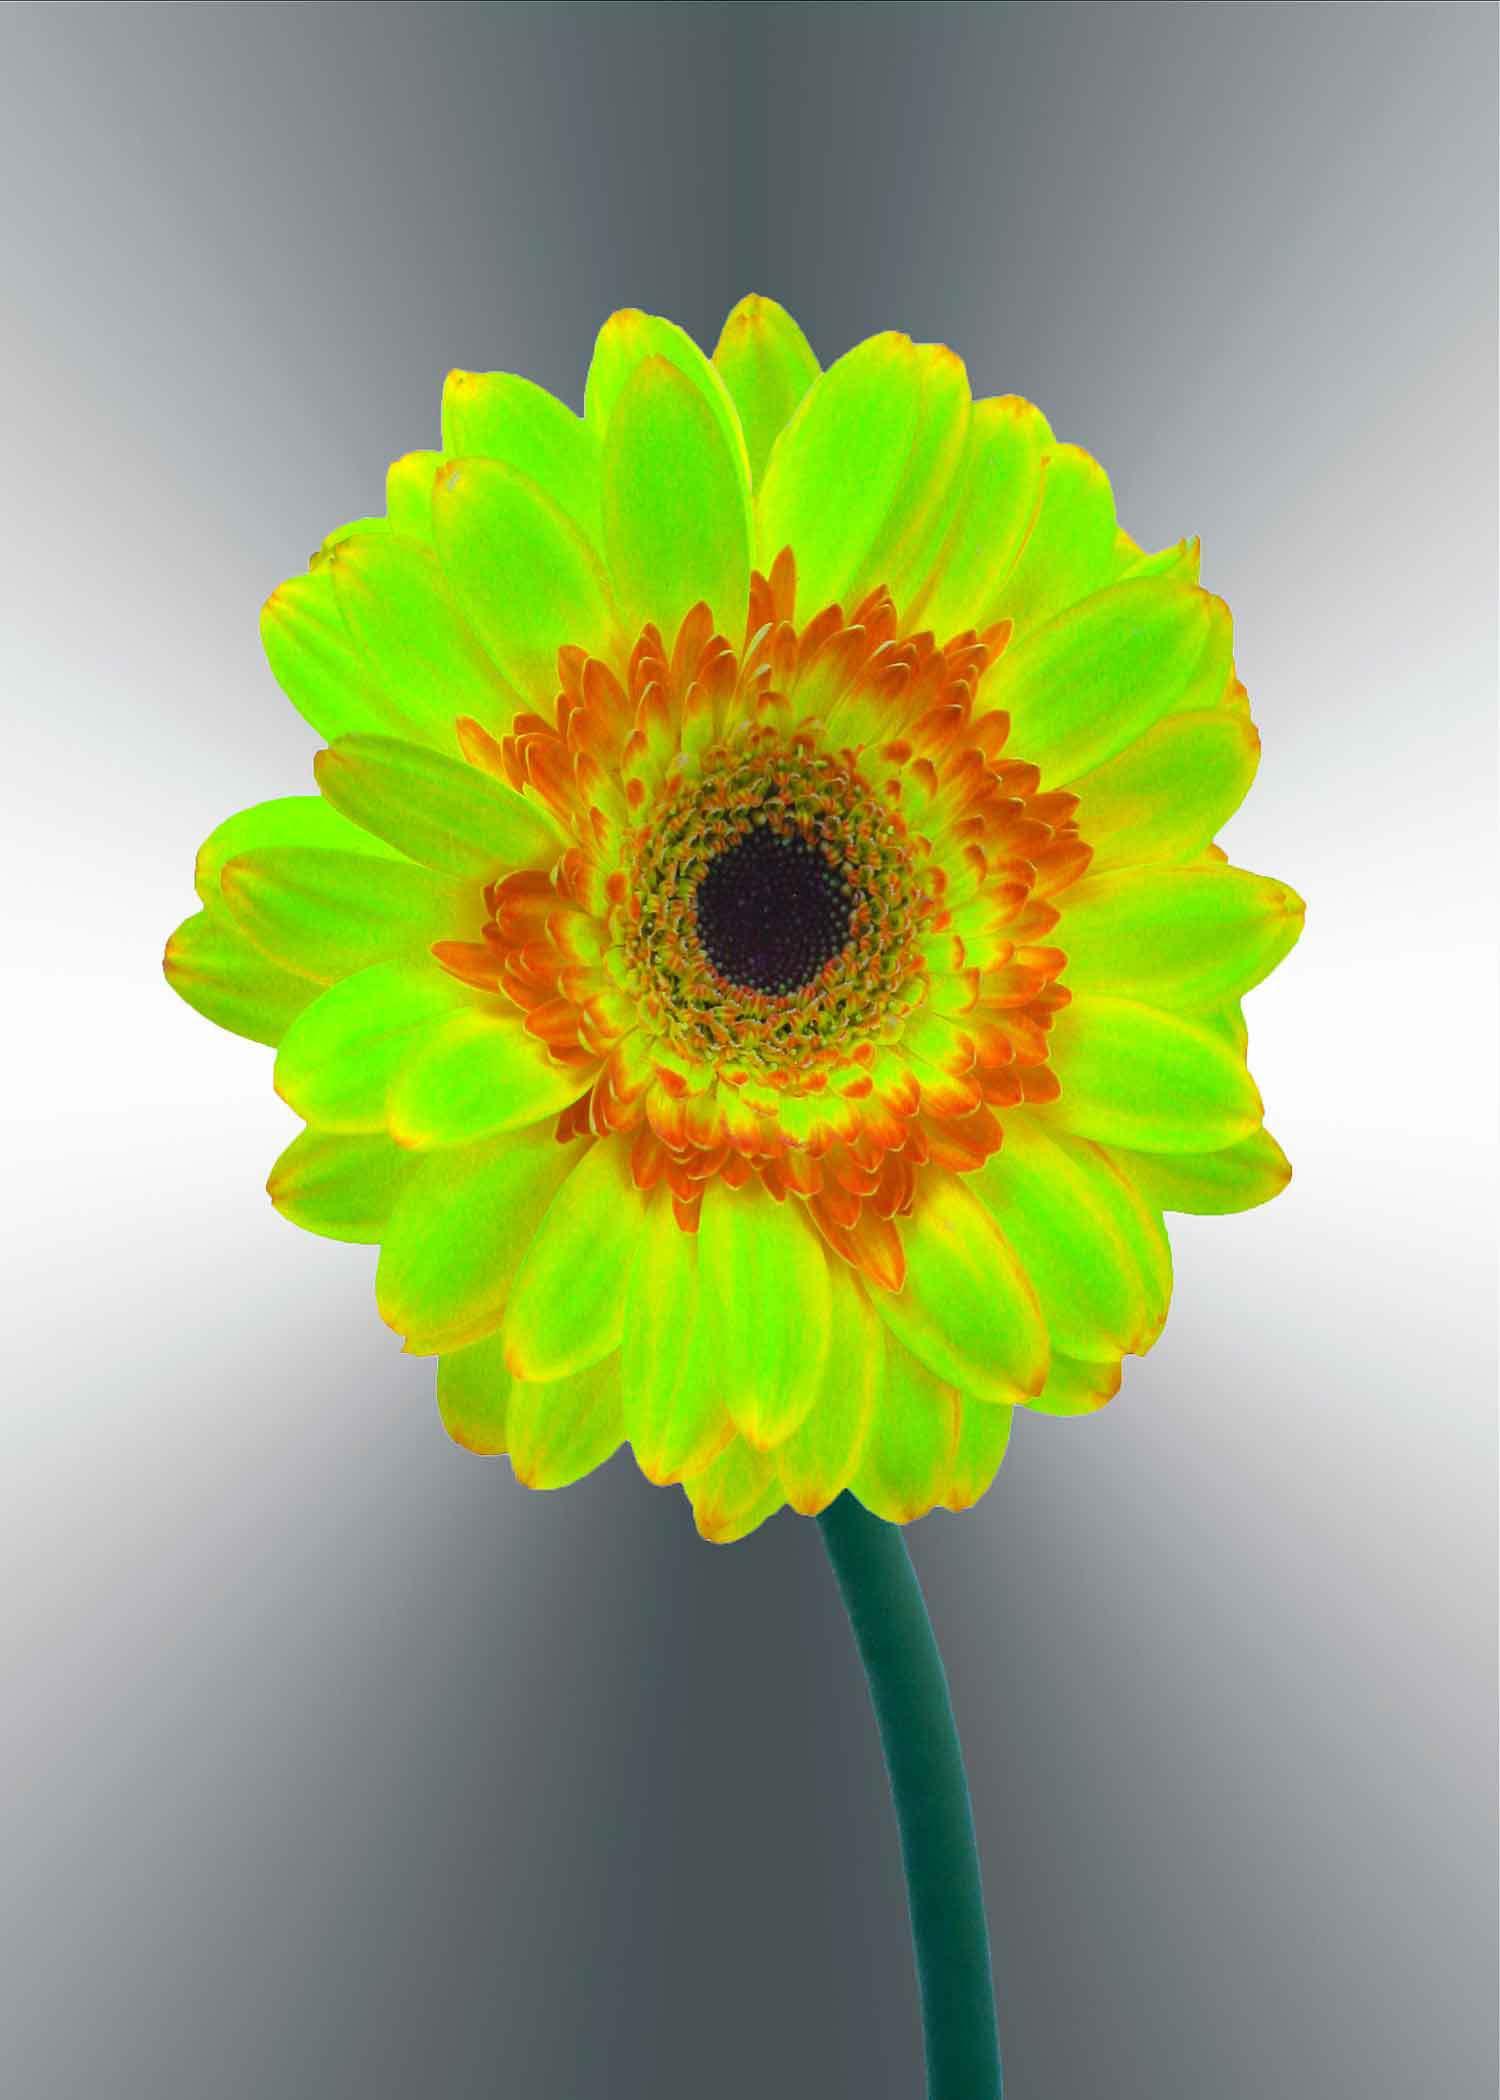 green-gerger-daisy-5x7-(22-of-236)-Edit-2-copy-2.jpg